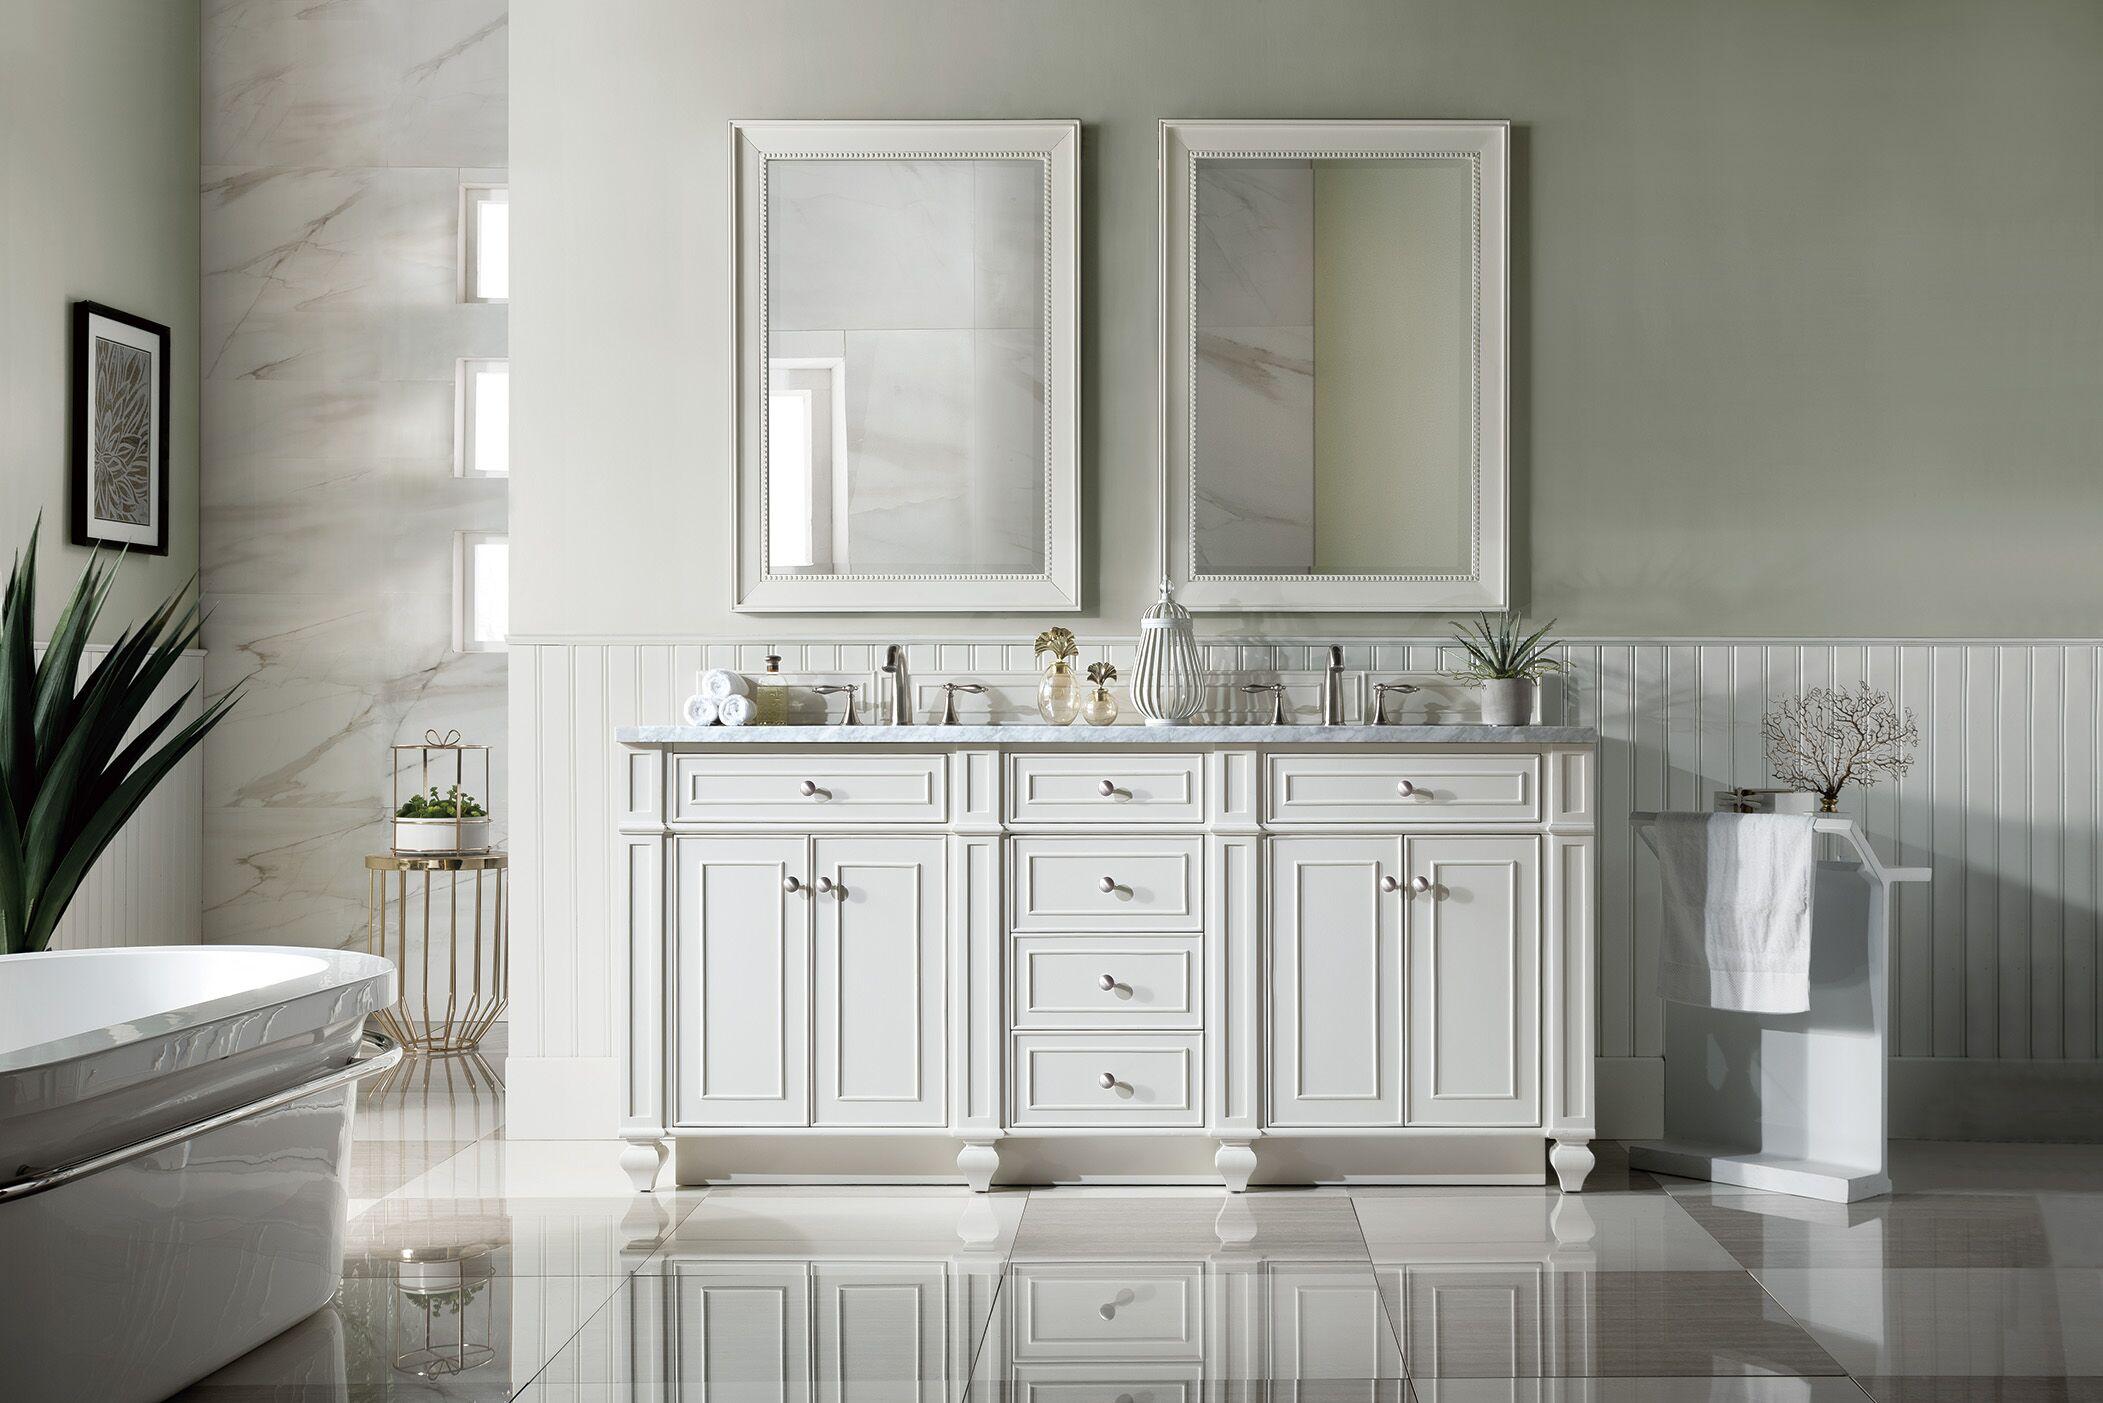 72 inch Double Sink Bathroom Vanity Cottage